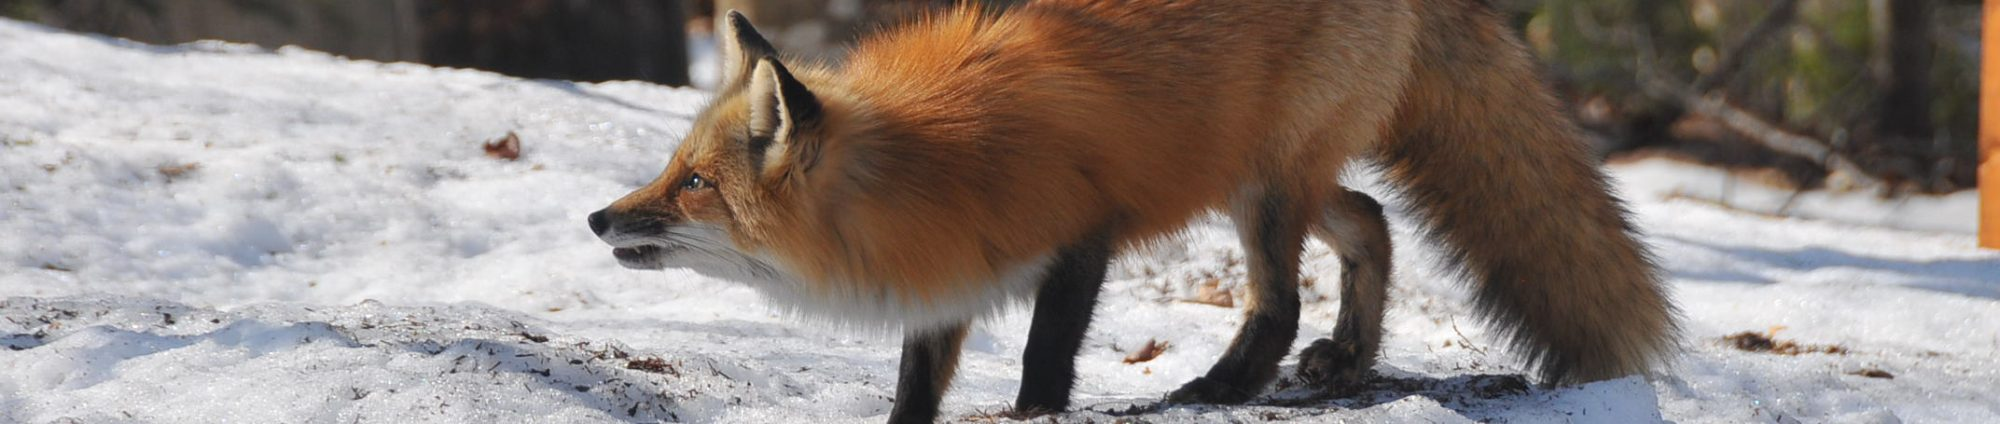 Programmes Coyote